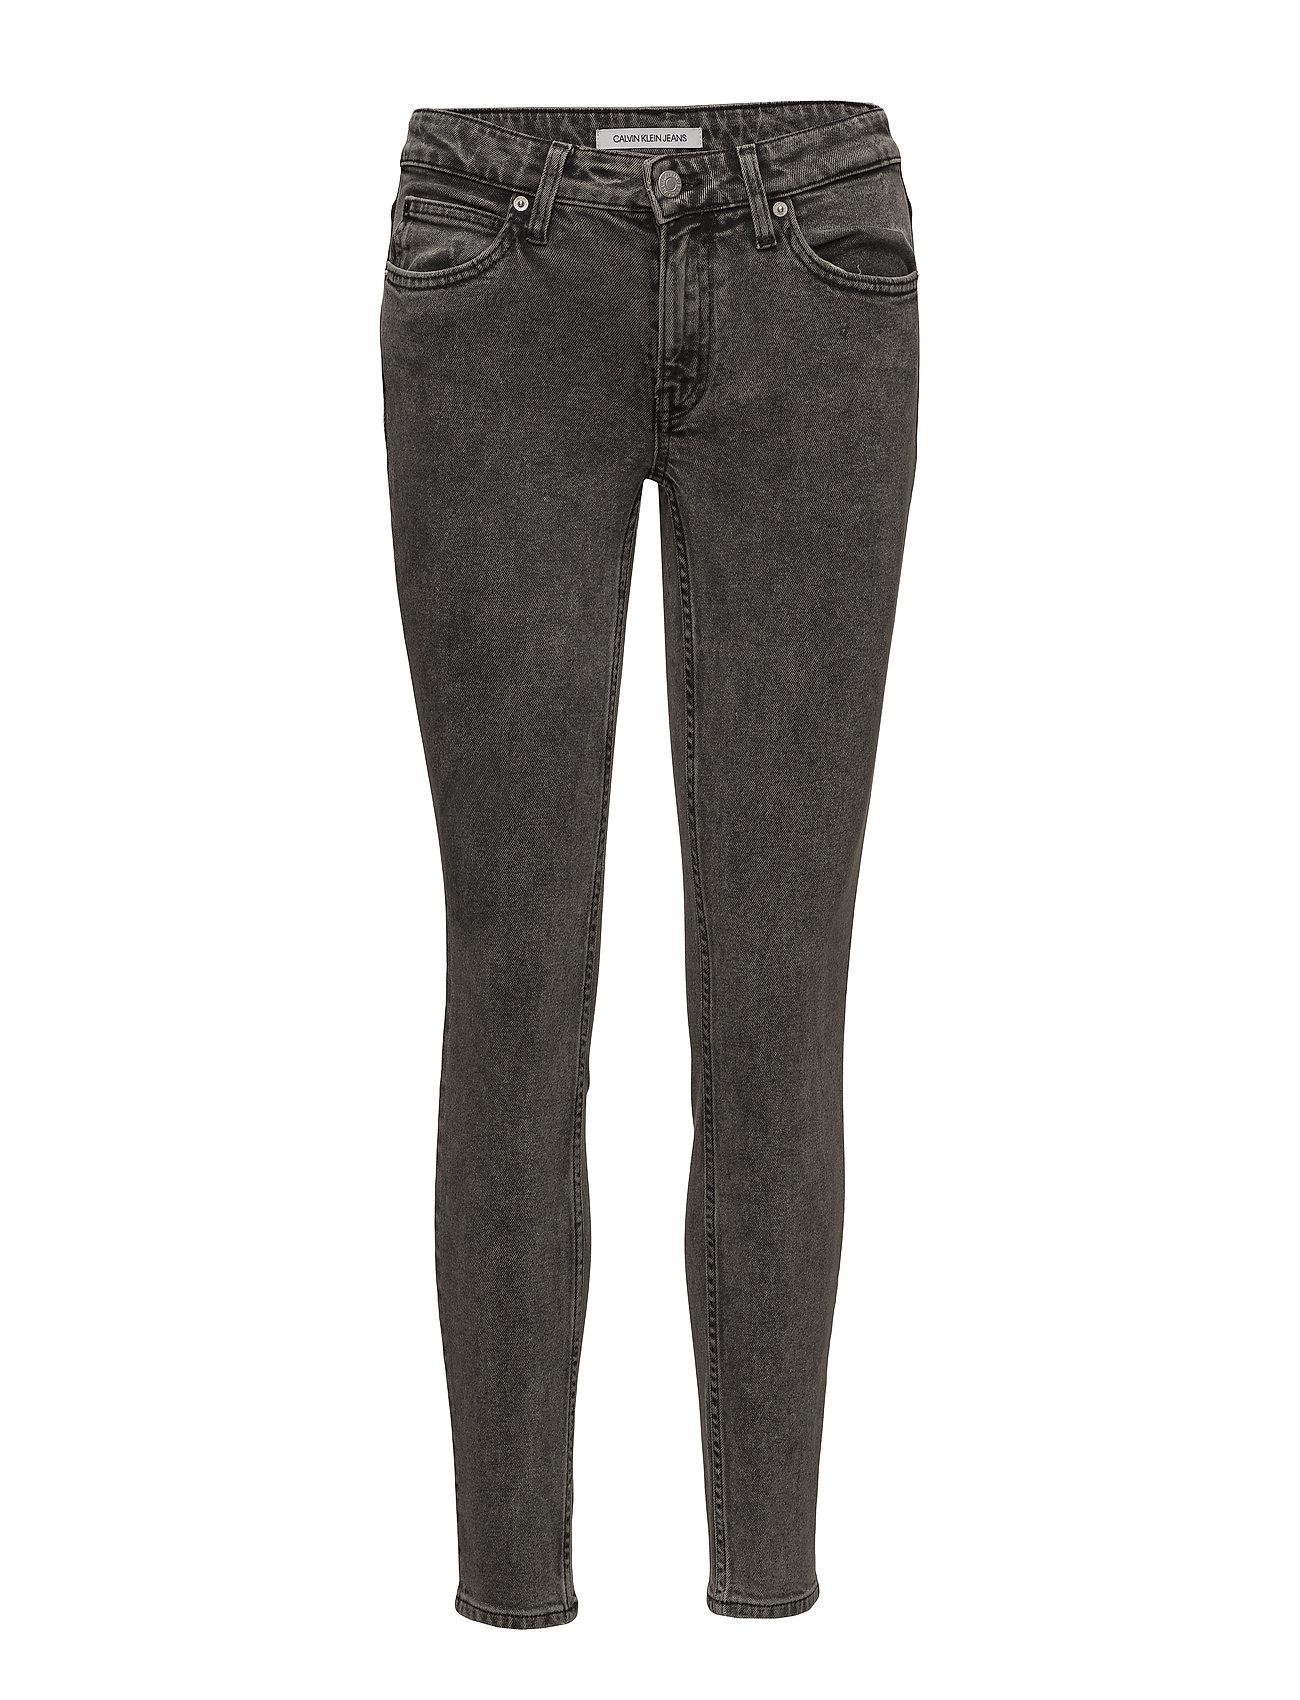 Calvin Klein Jeans CKJ 011: Mid Rise Sk - VAUCLUSE BLACK